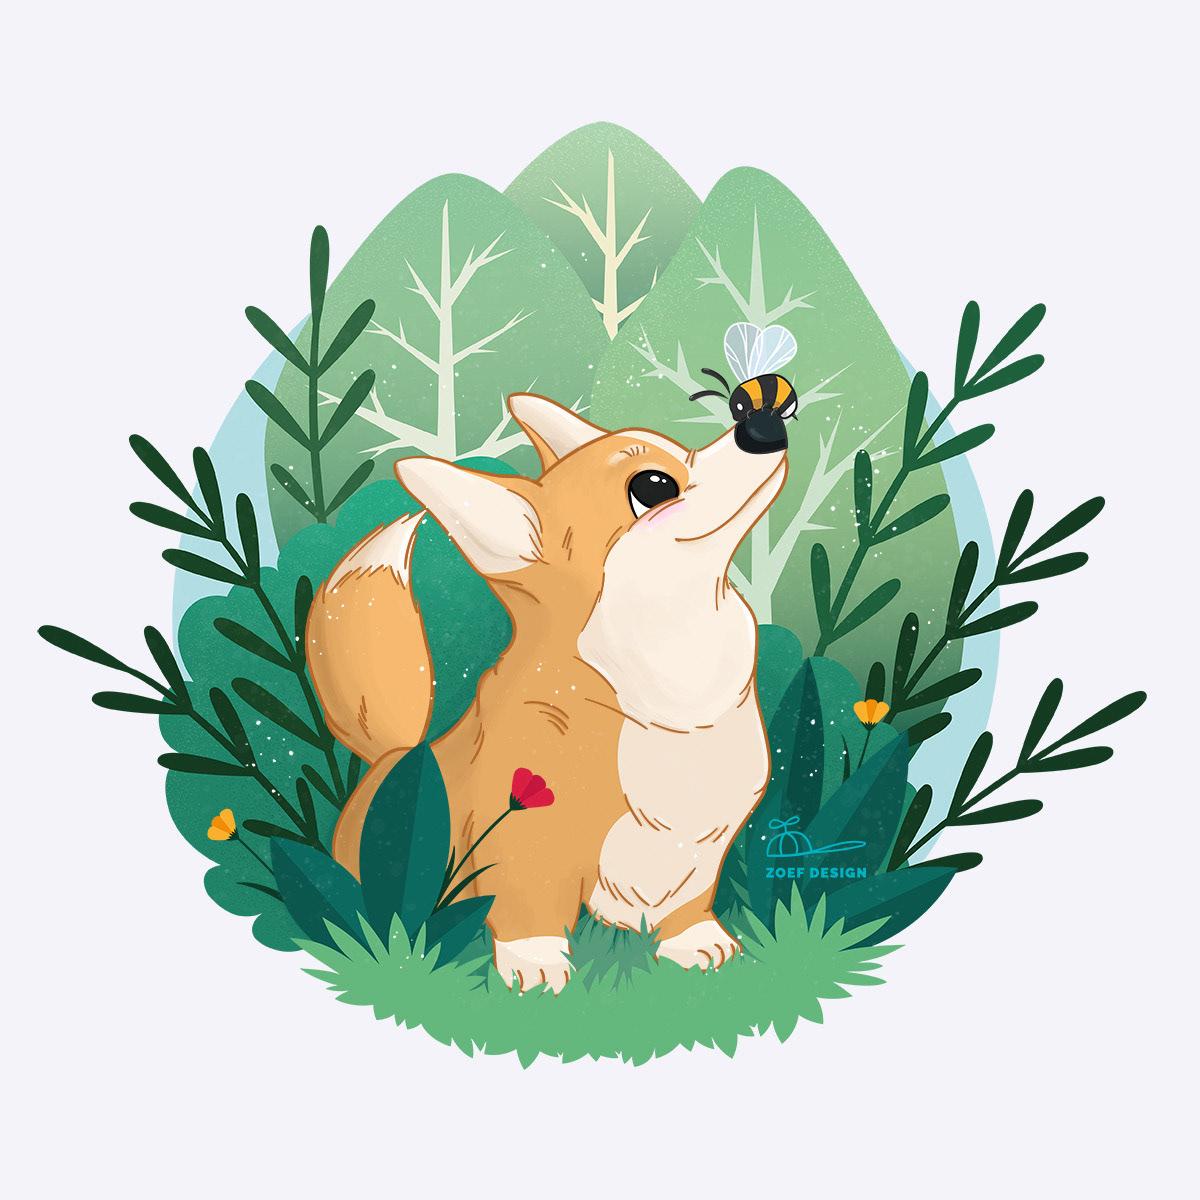 adobe illustrator,Adobe Photoshop,cute animals,cute dog,digital illustration